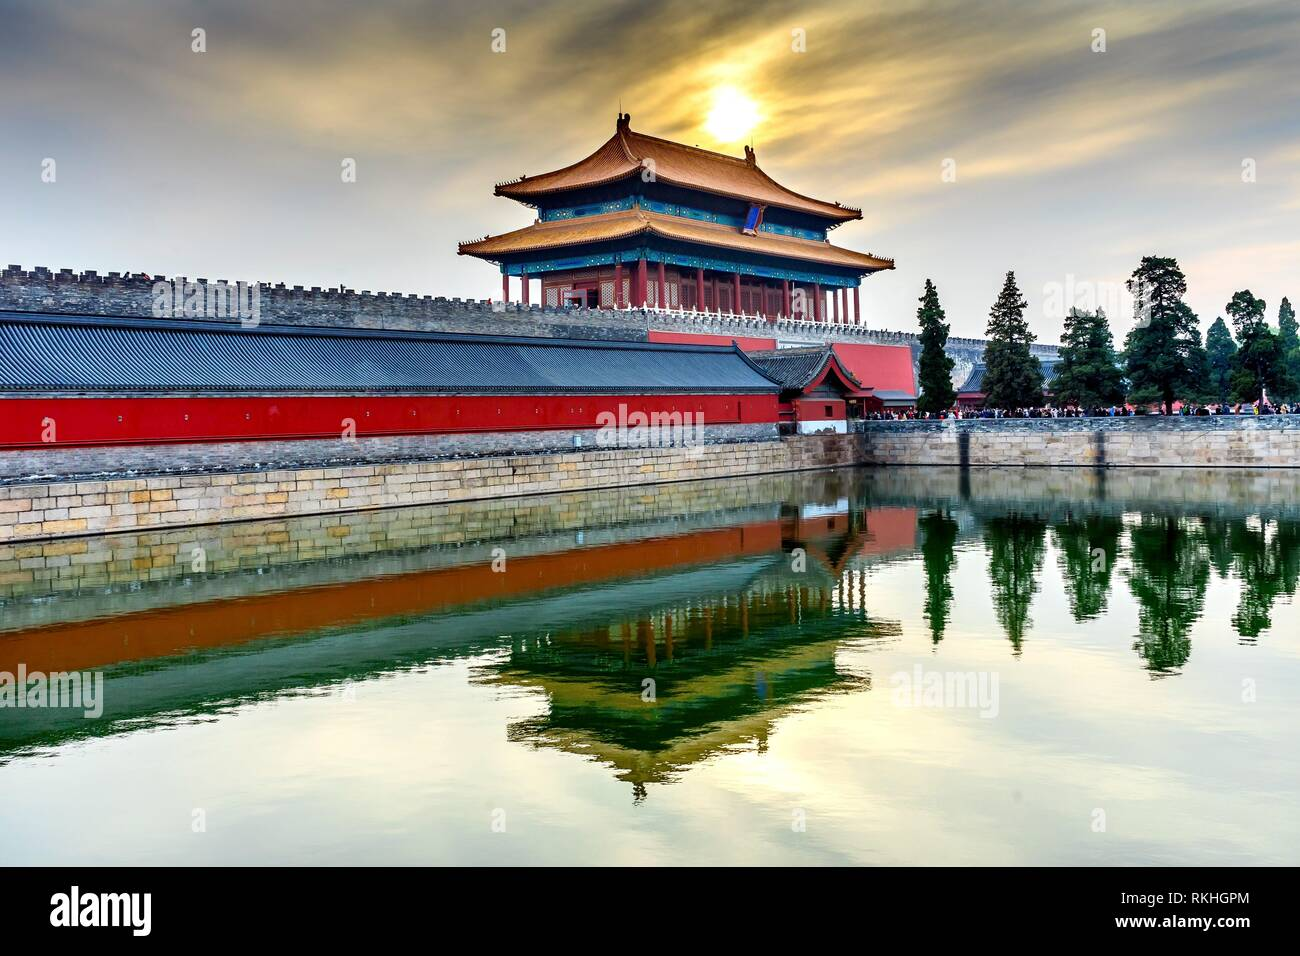 Hinteres Gatter himmlische Reinheit Gugong Verbotene Stadt Graben Canal Plaace Wand Beijing China. Der Kaiserpalast in den 1600er Jahren in der Ming Dynastie errichtet. Stockbild